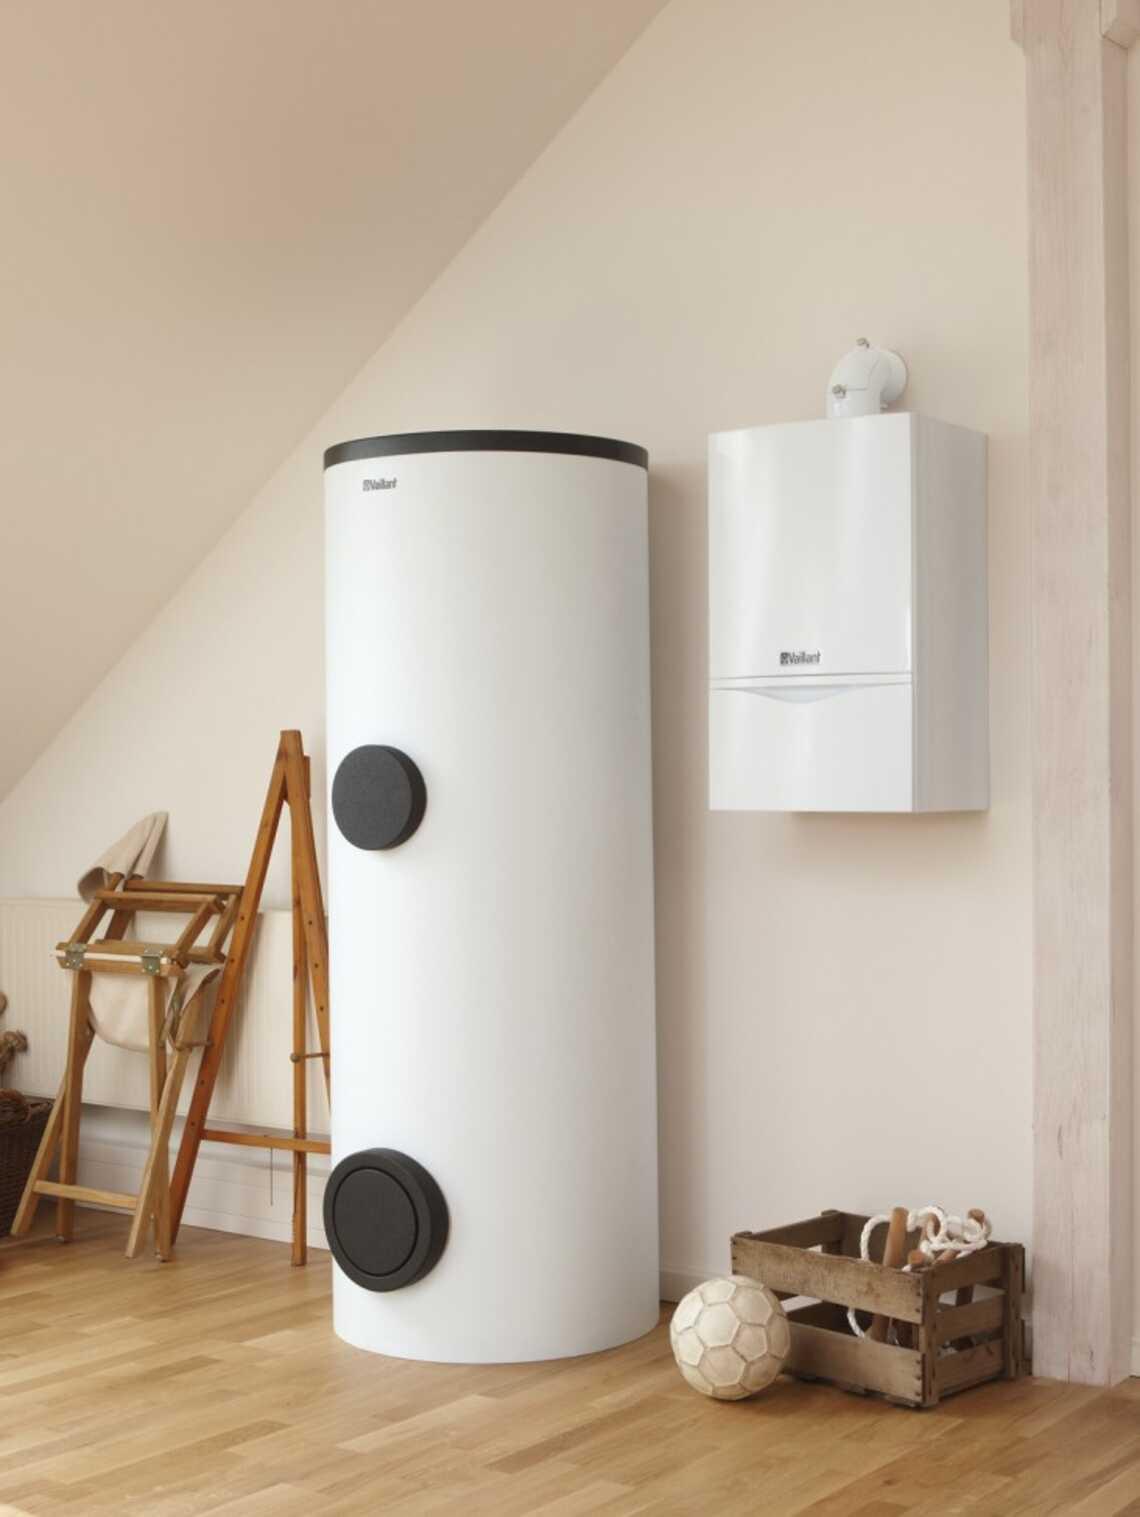 vaillant marque chauffe eau solaire individuel pressuris. Black Bedroom Furniture Sets. Home Design Ideas